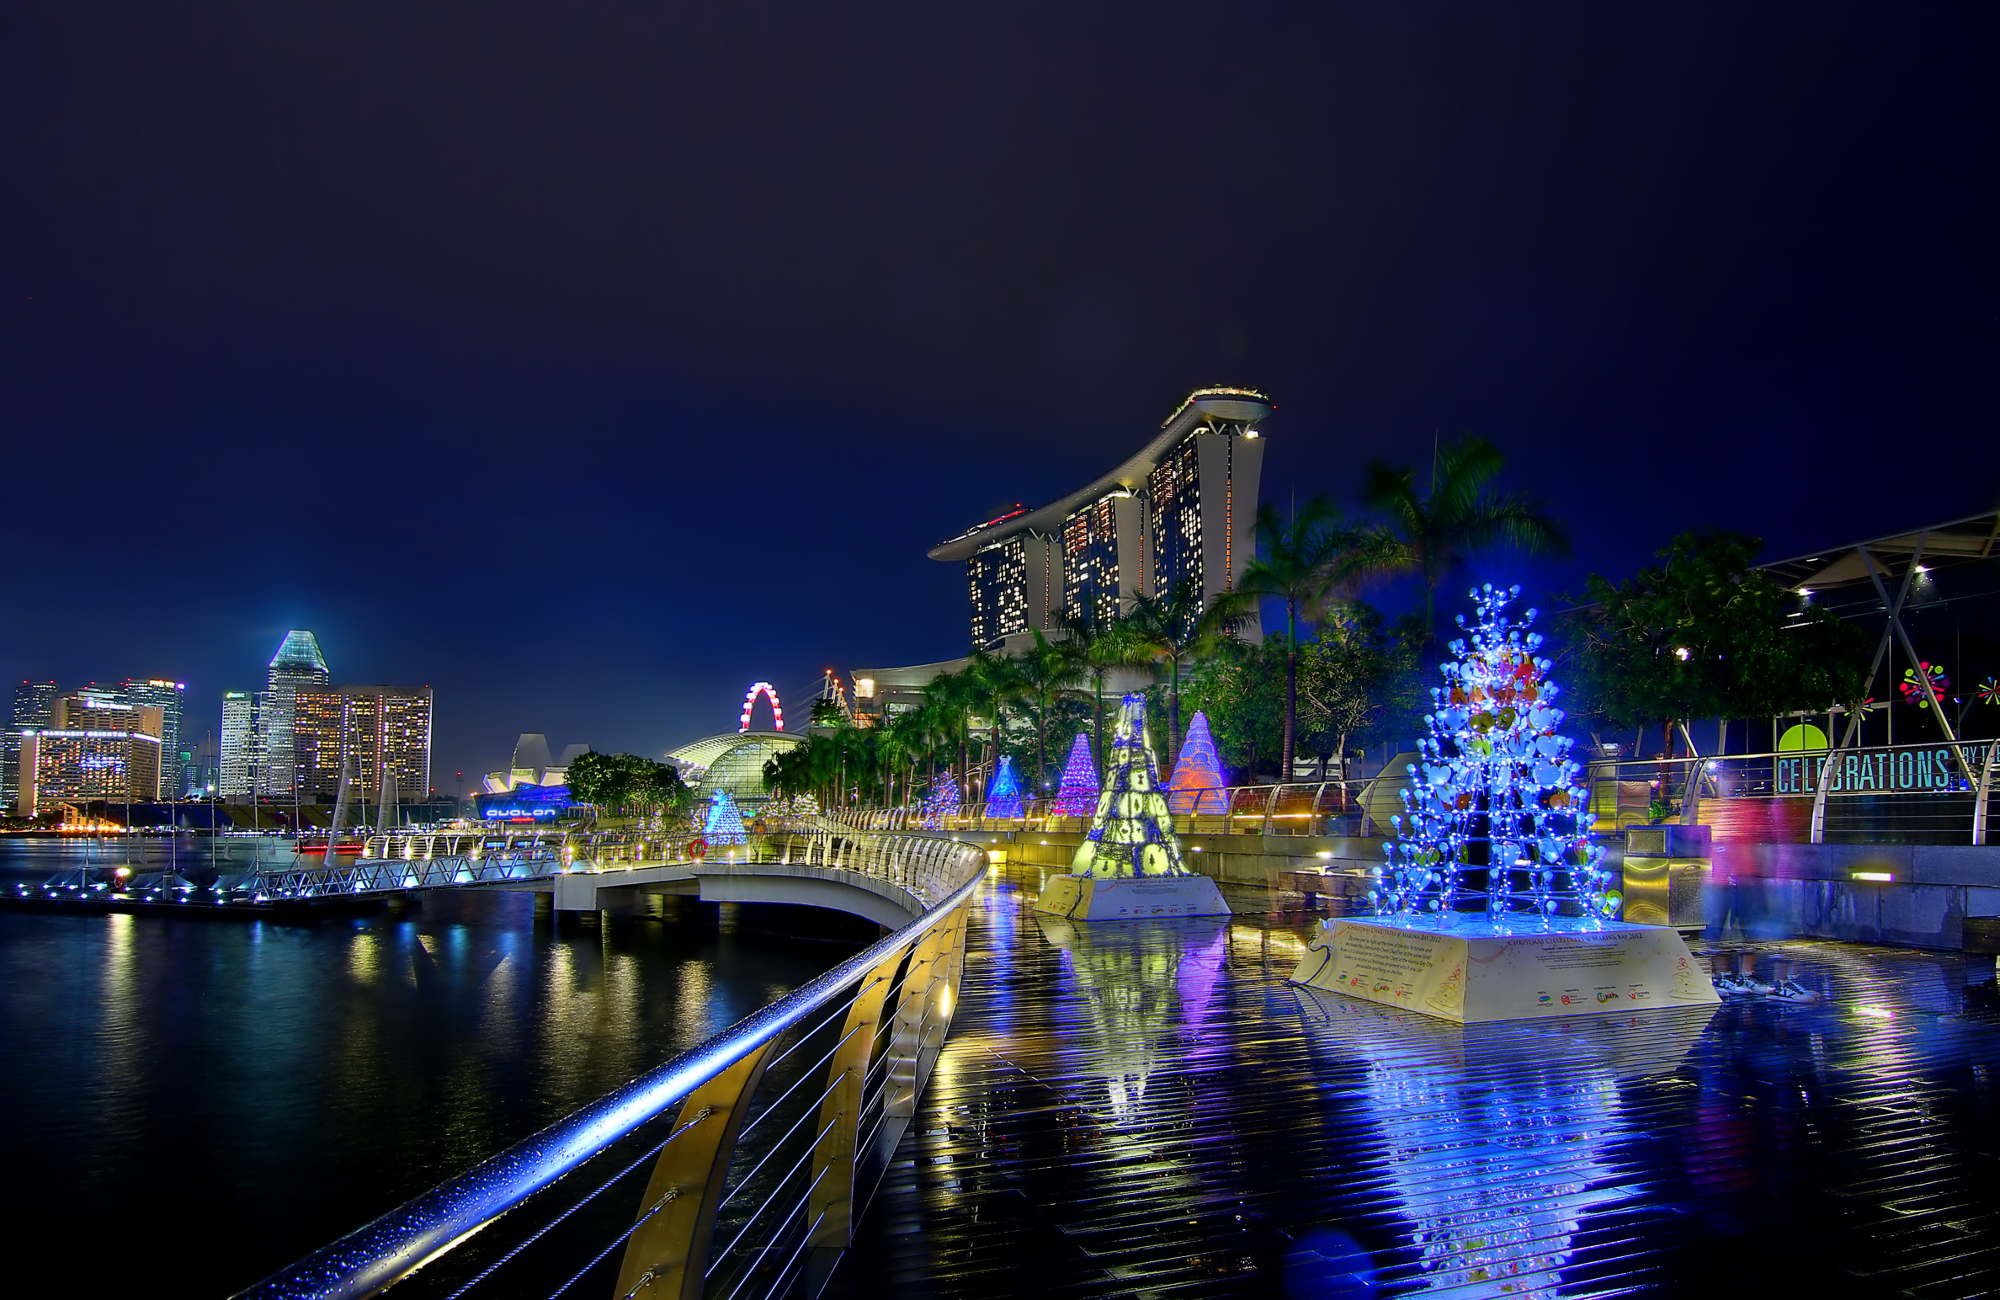 The Bay Christmas Trees